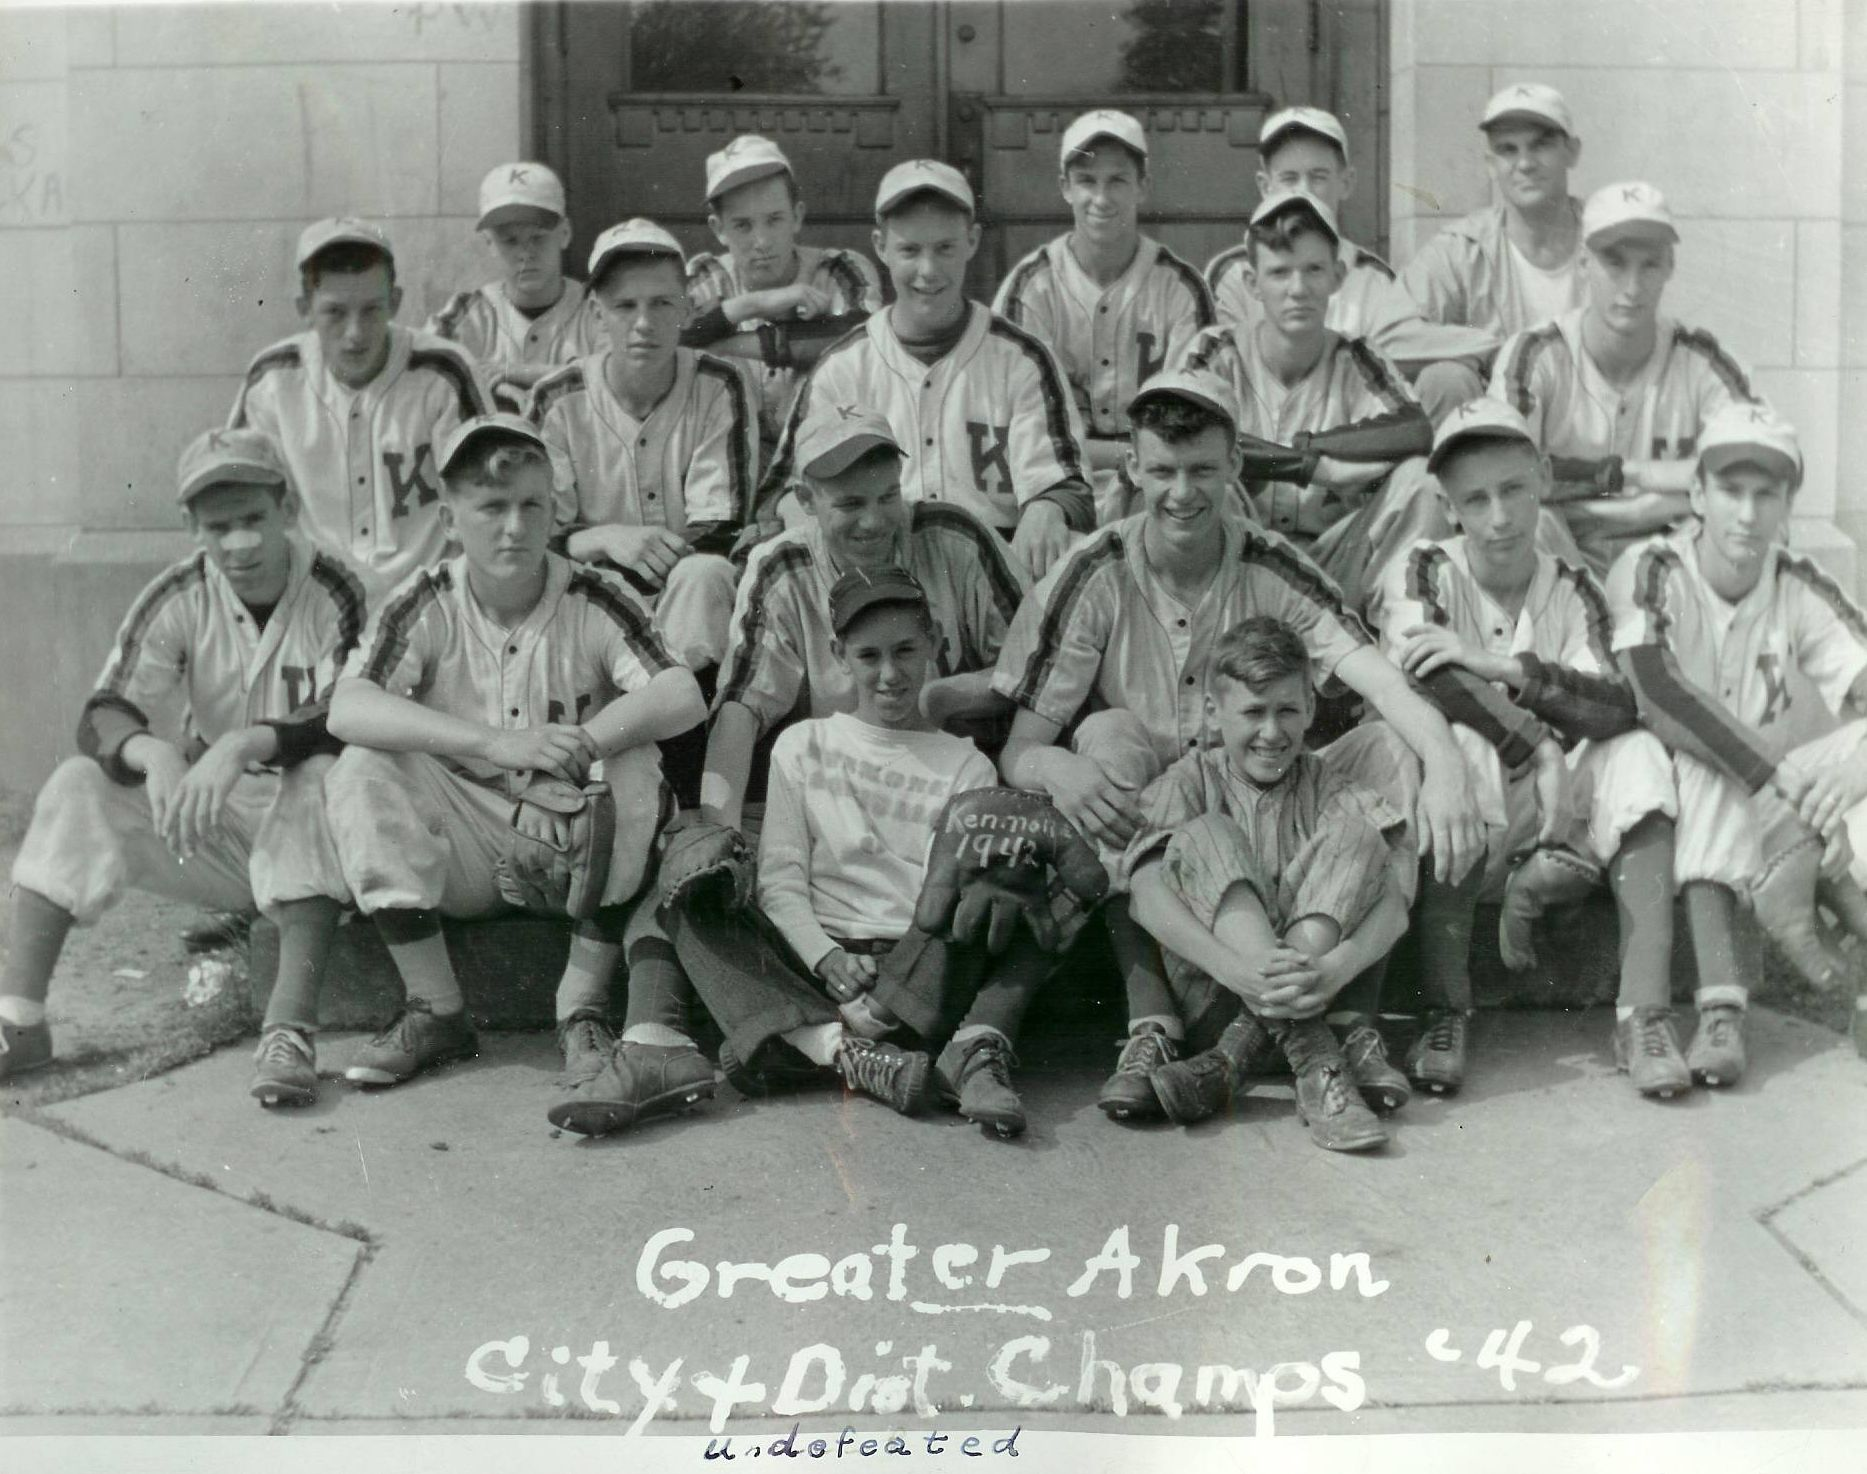 SPORTS - 1942 KHS BASEBALL - Greater Akron City & District Champs.jpg